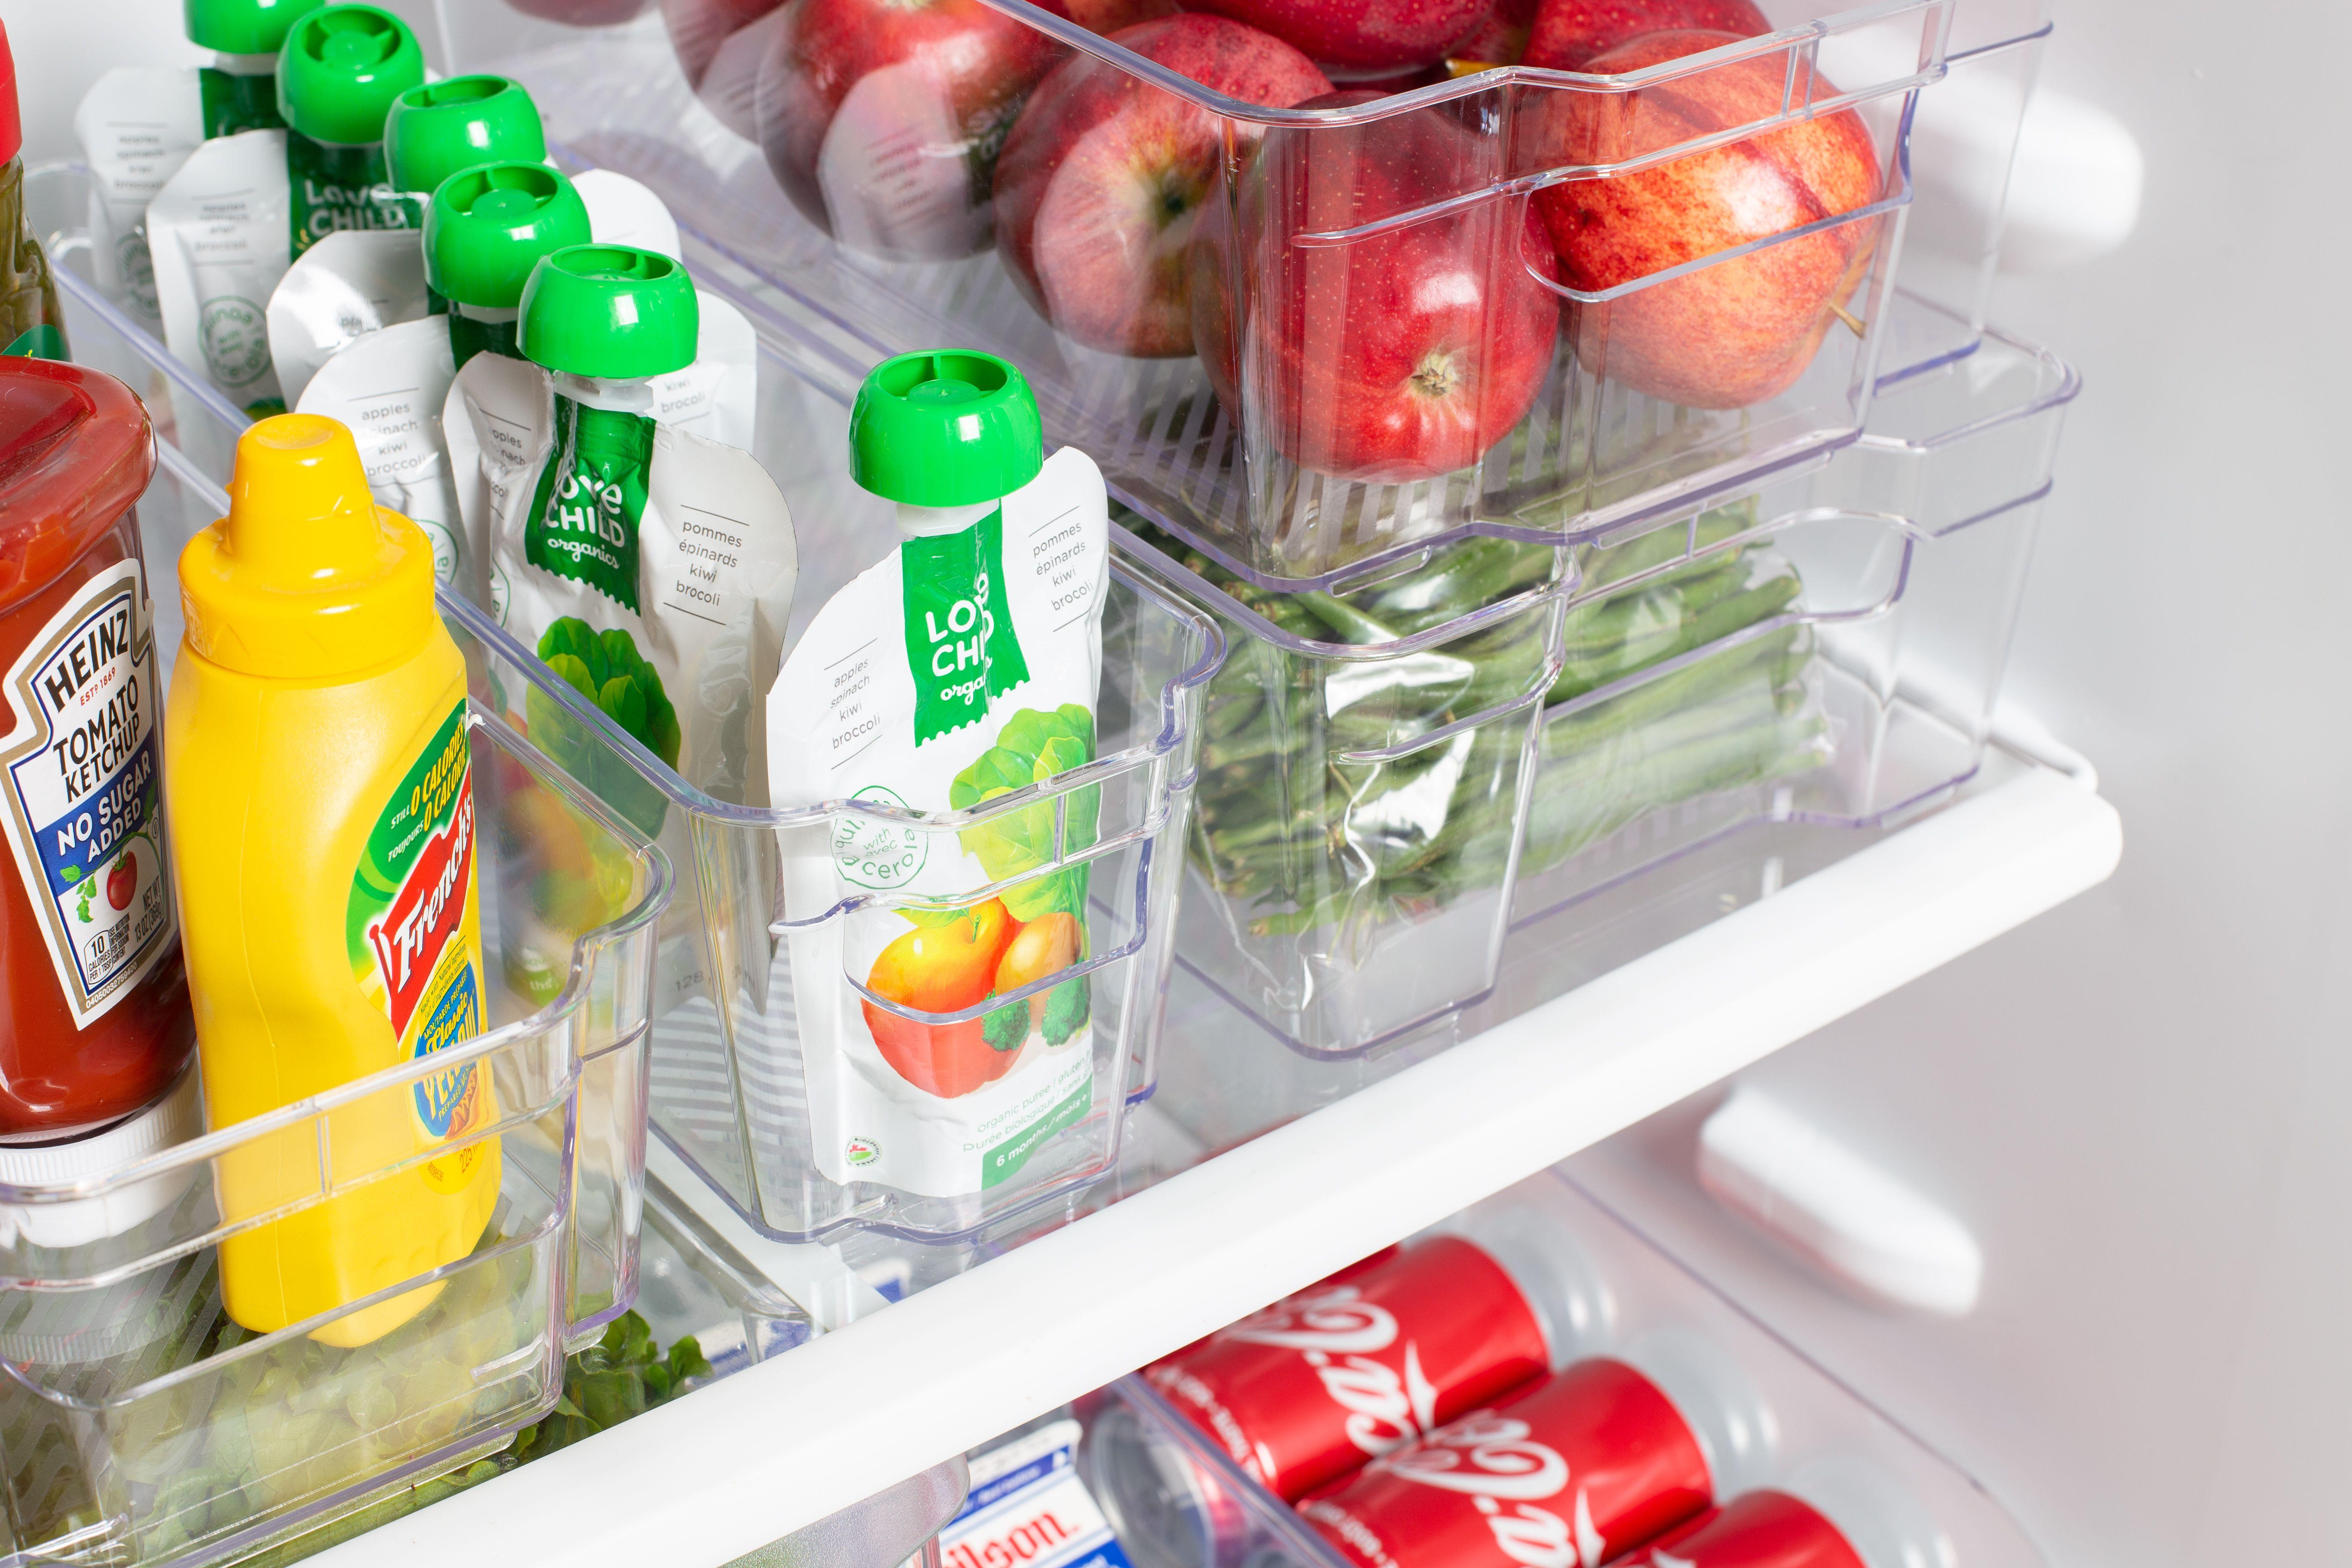 Fridge Stor fridge organizers